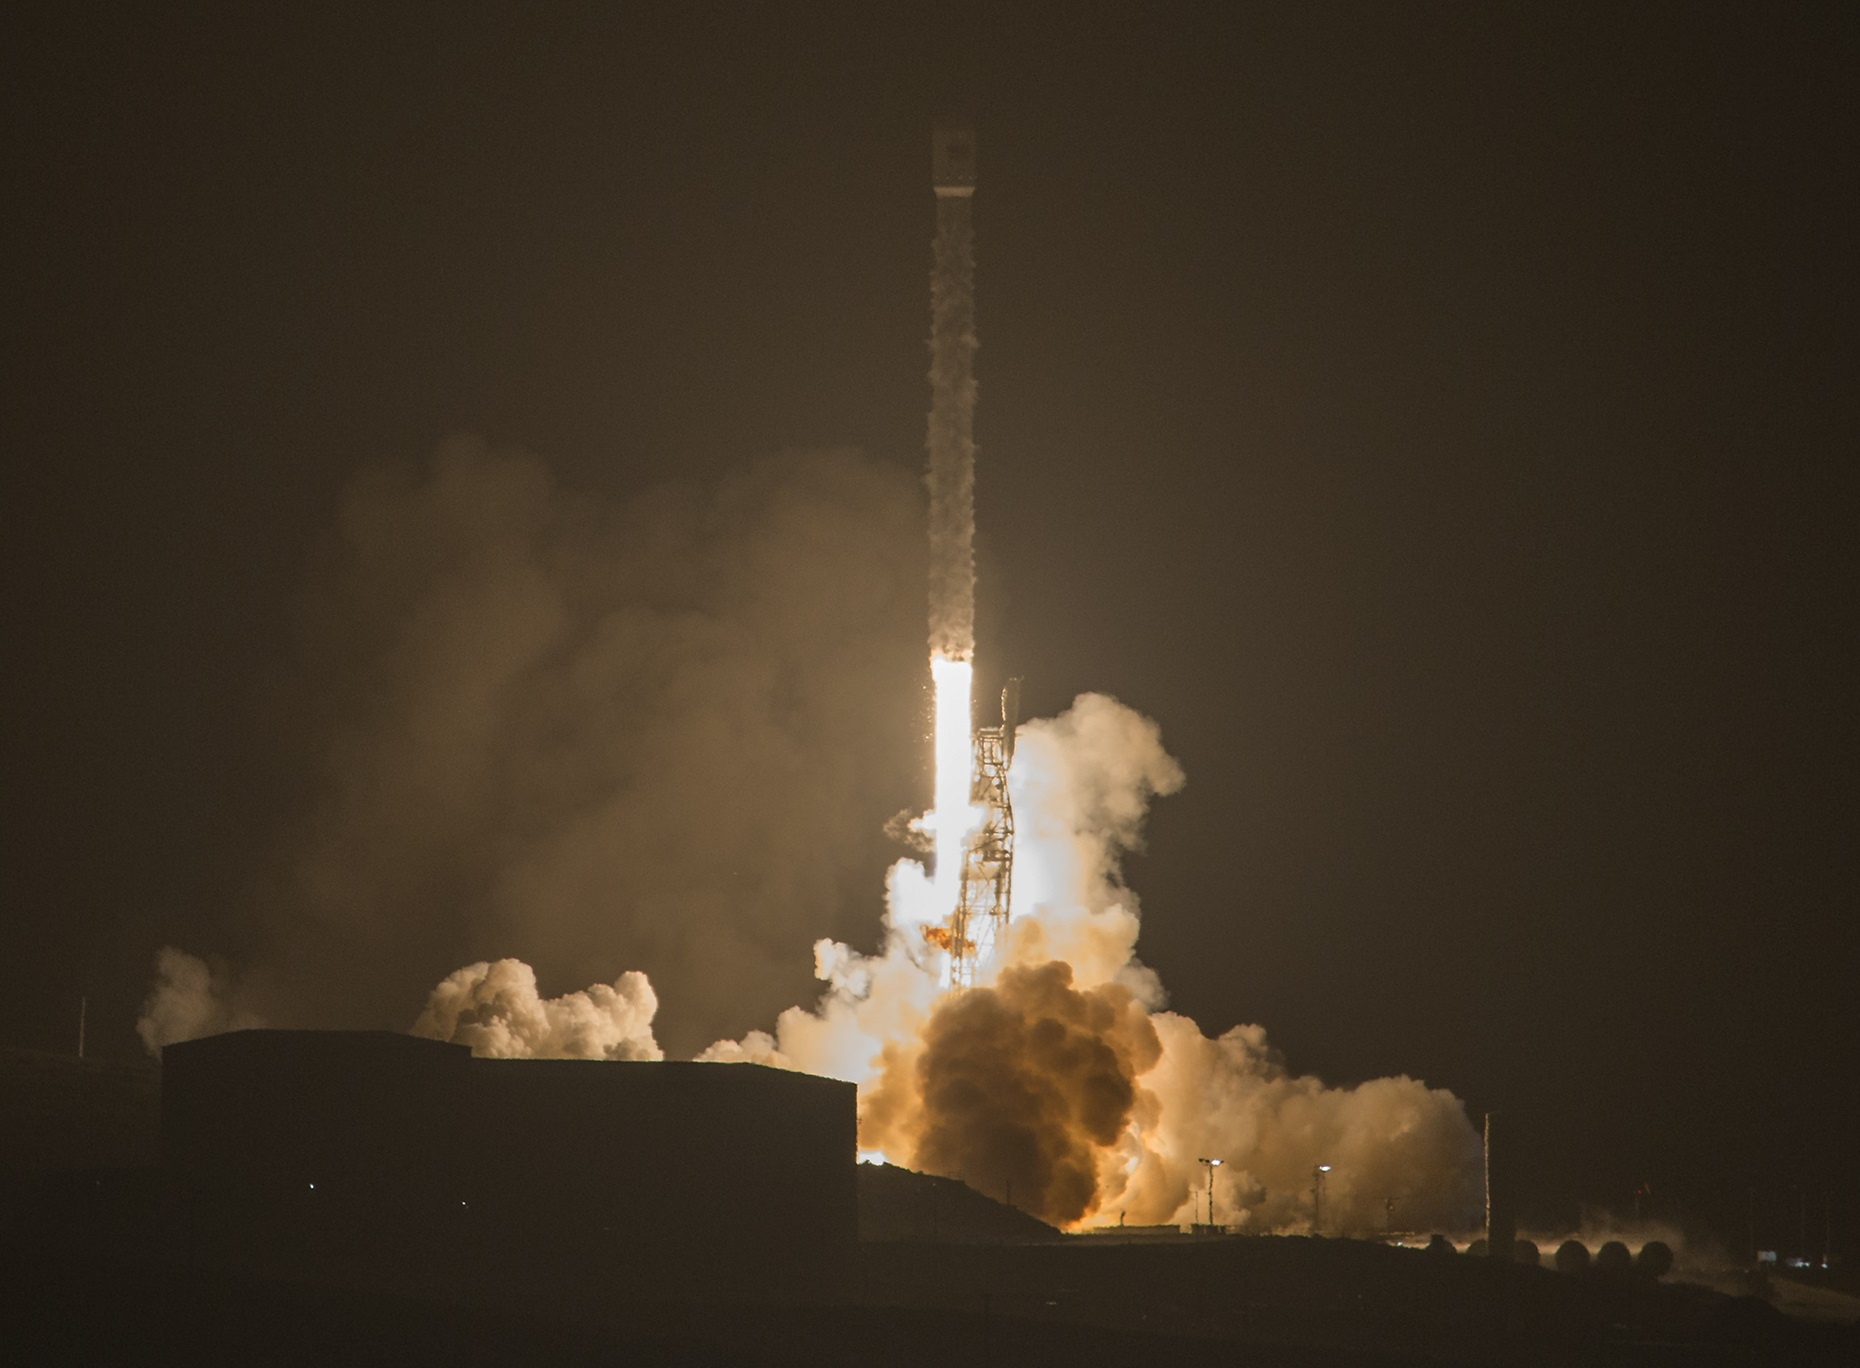 Falcon 9 Delivers 3rd Iridium-NEXT Satellite Batch, 1st Stage